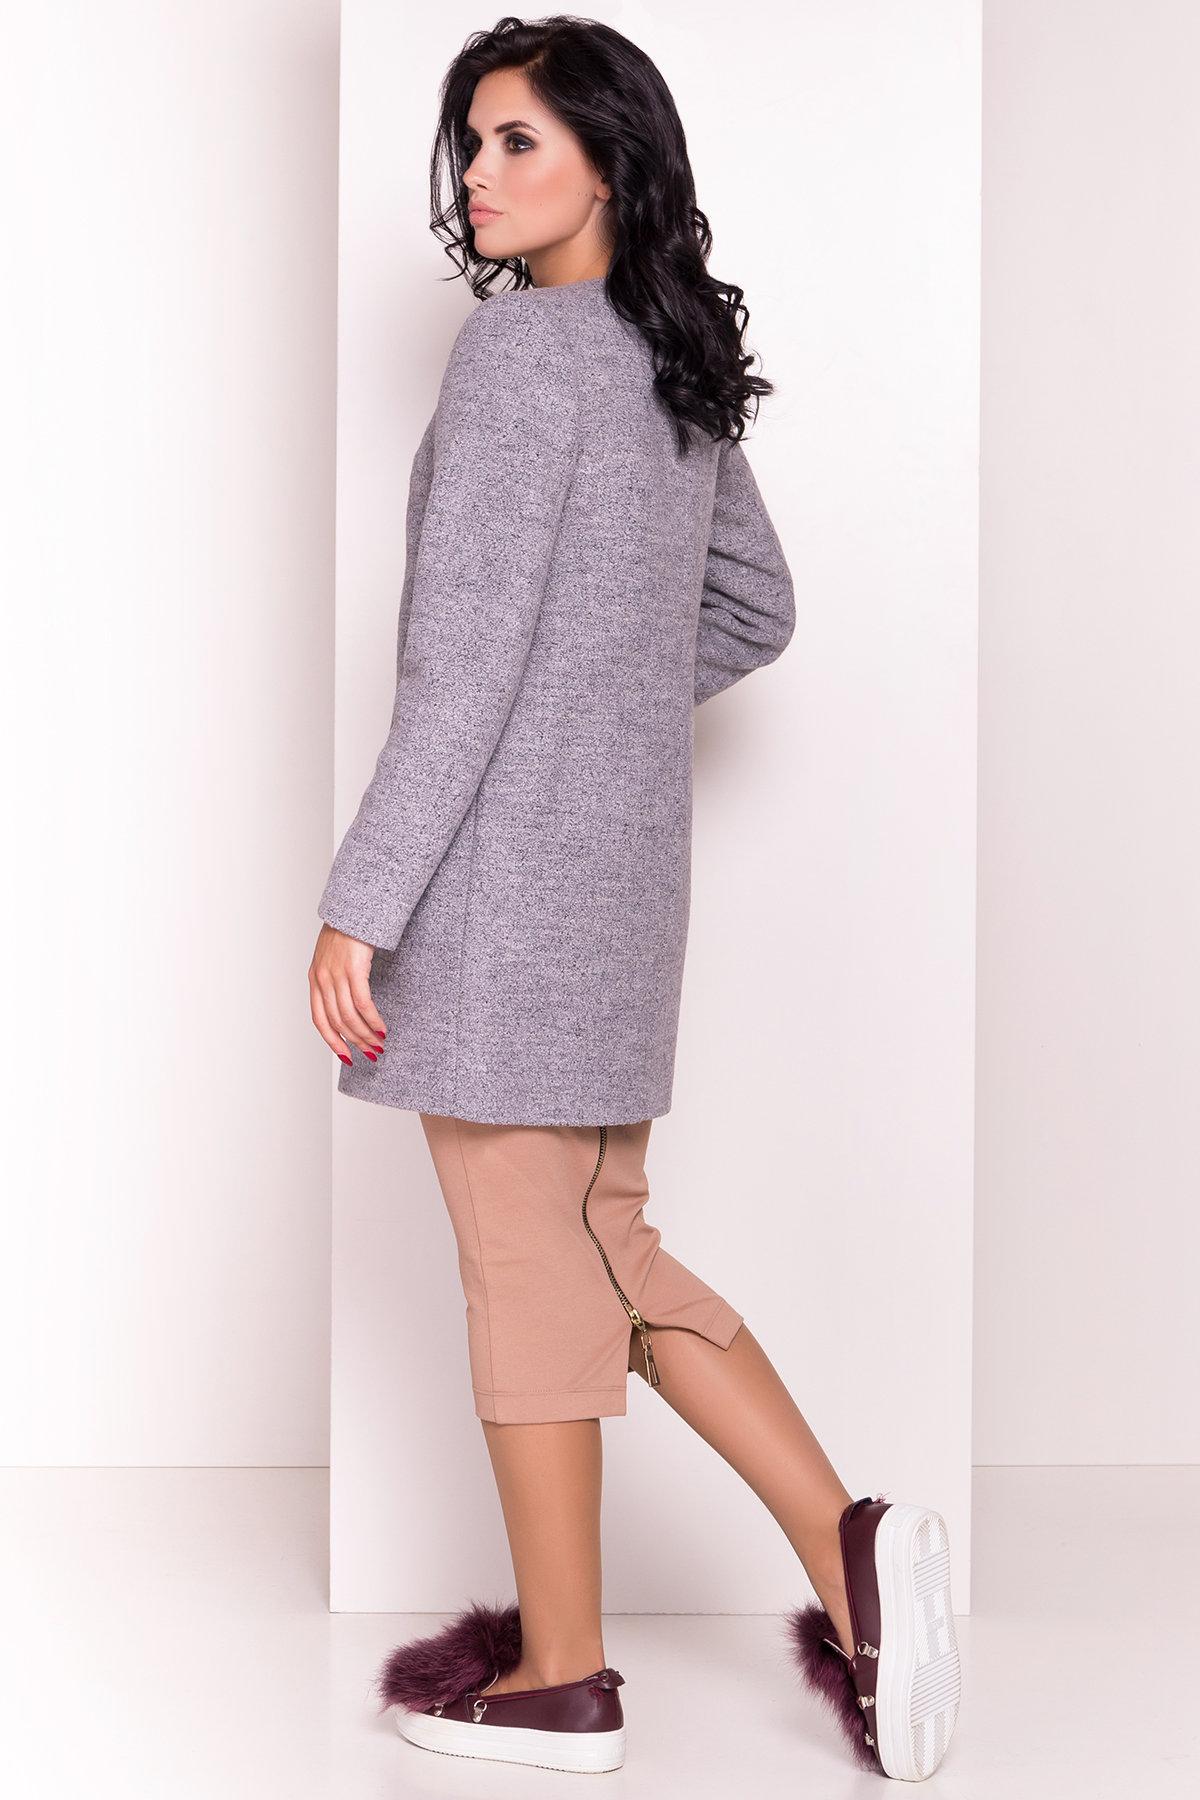 Пальто Дакс 1679 АРТ. 9498 Цвет: Серый 48 - фото 3, интернет магазин tm-modus.ru